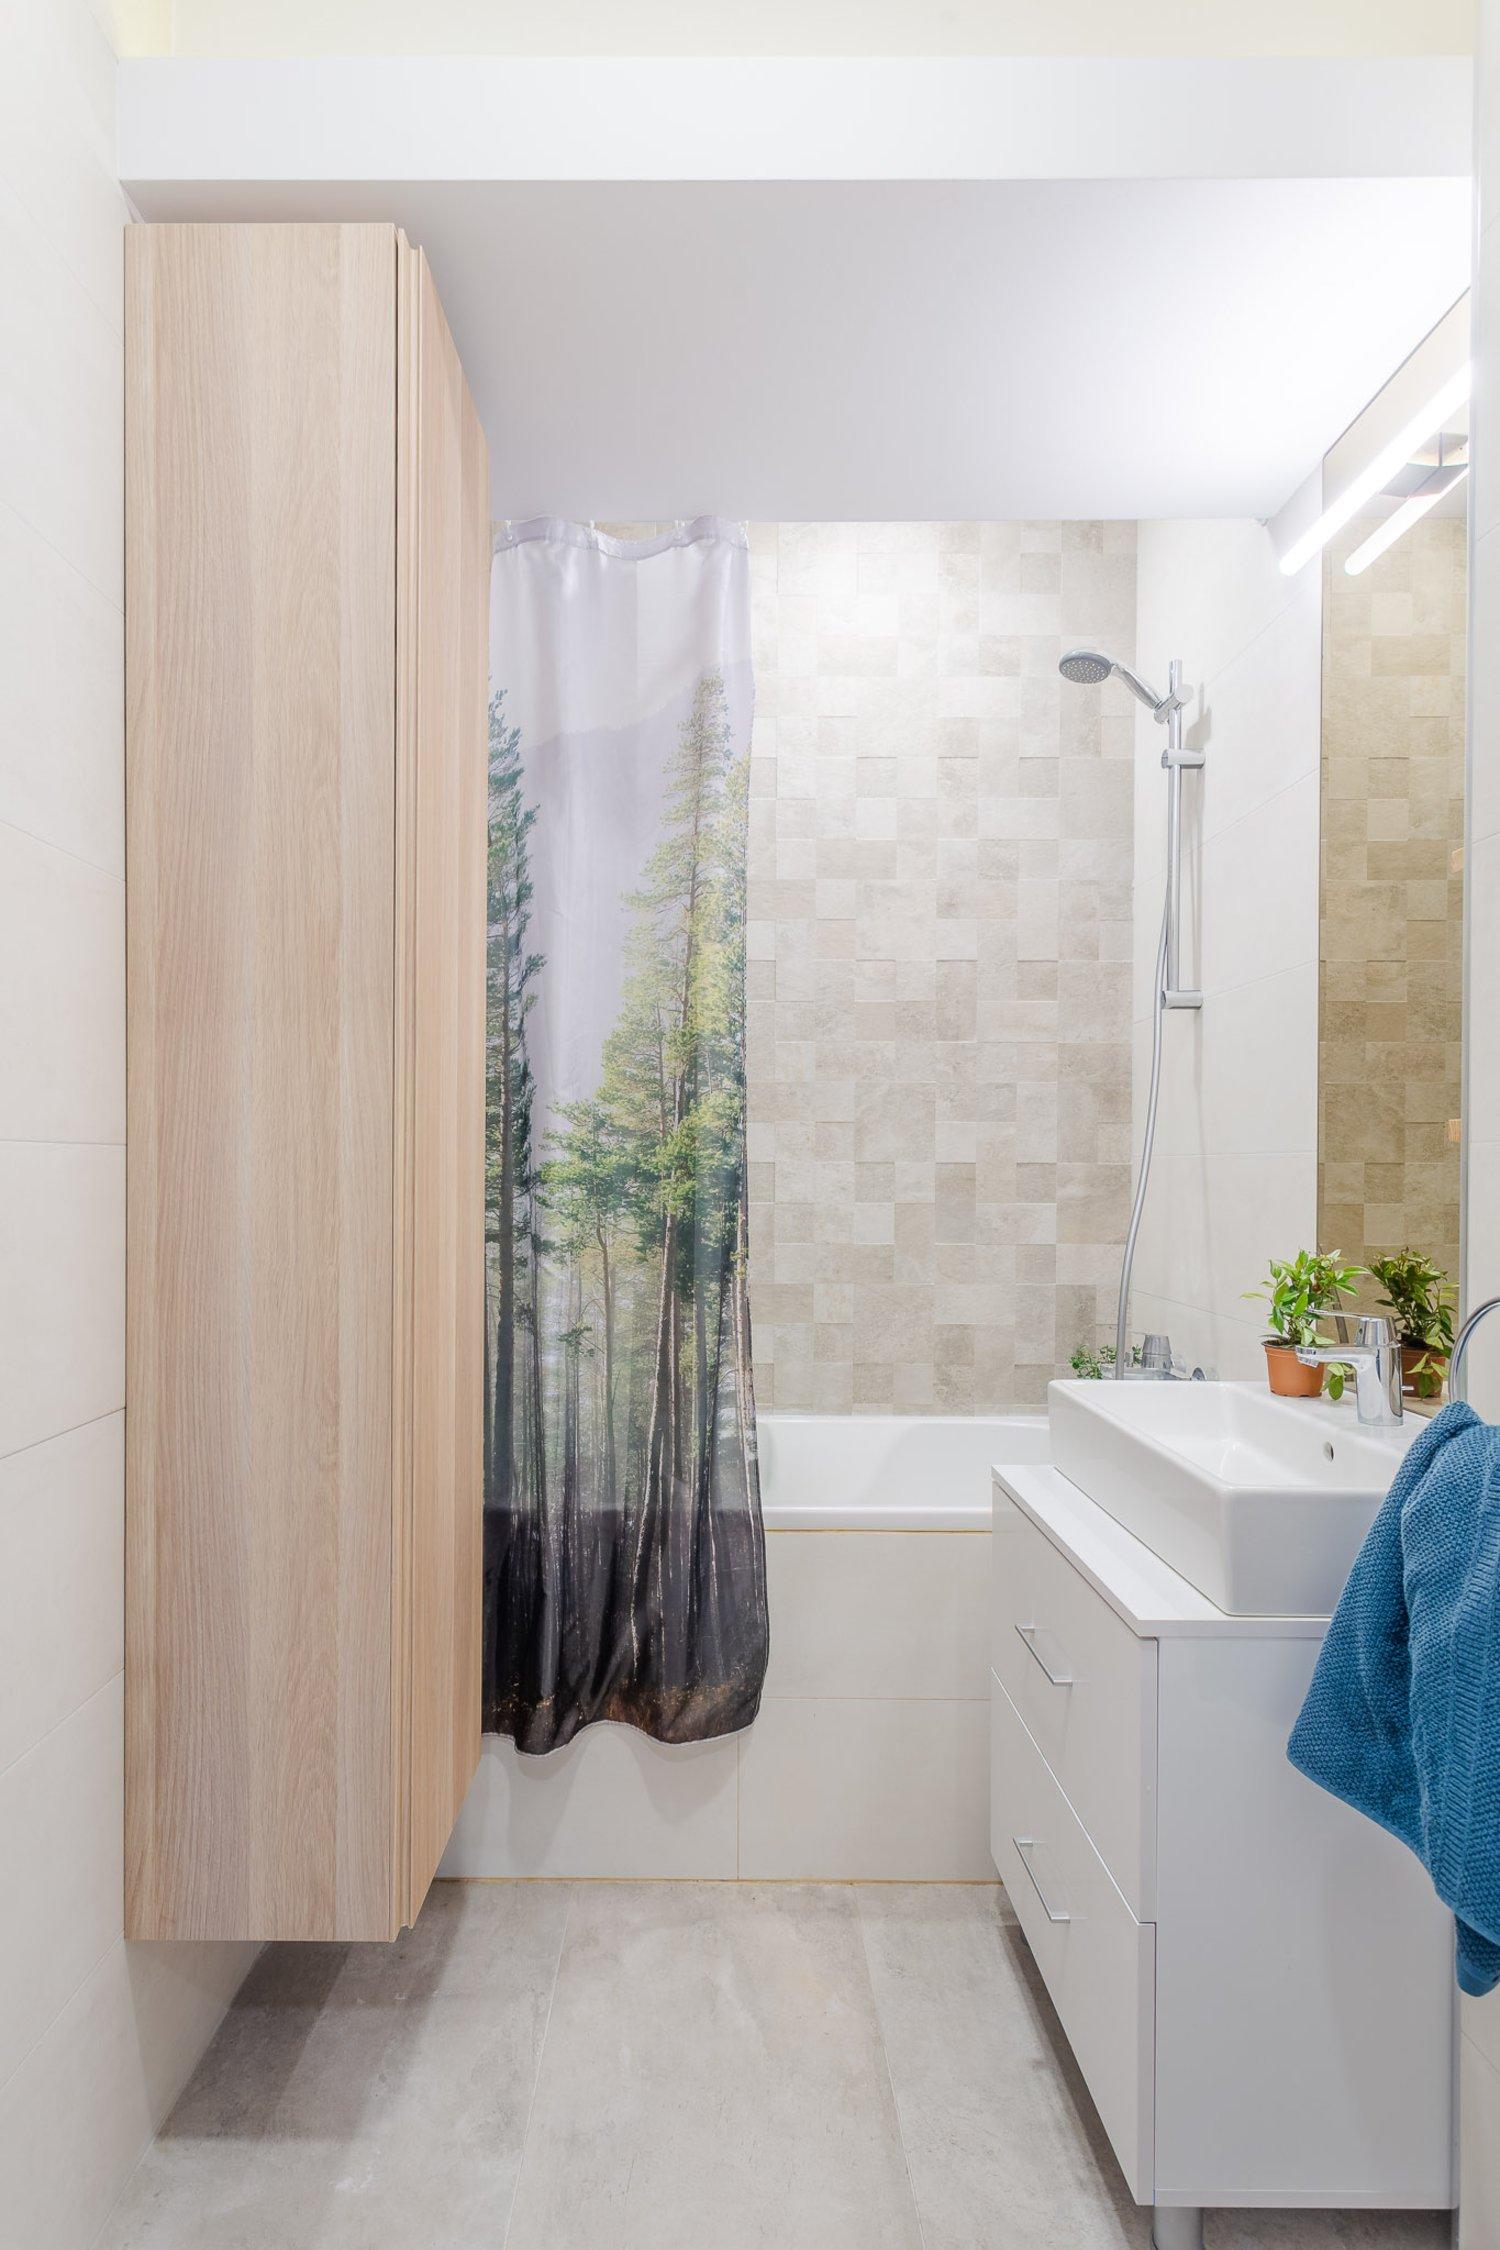 Amenajare apartament de burlac - baie minimalistă, mobilier alb, perdea de duș, dulap suspendat